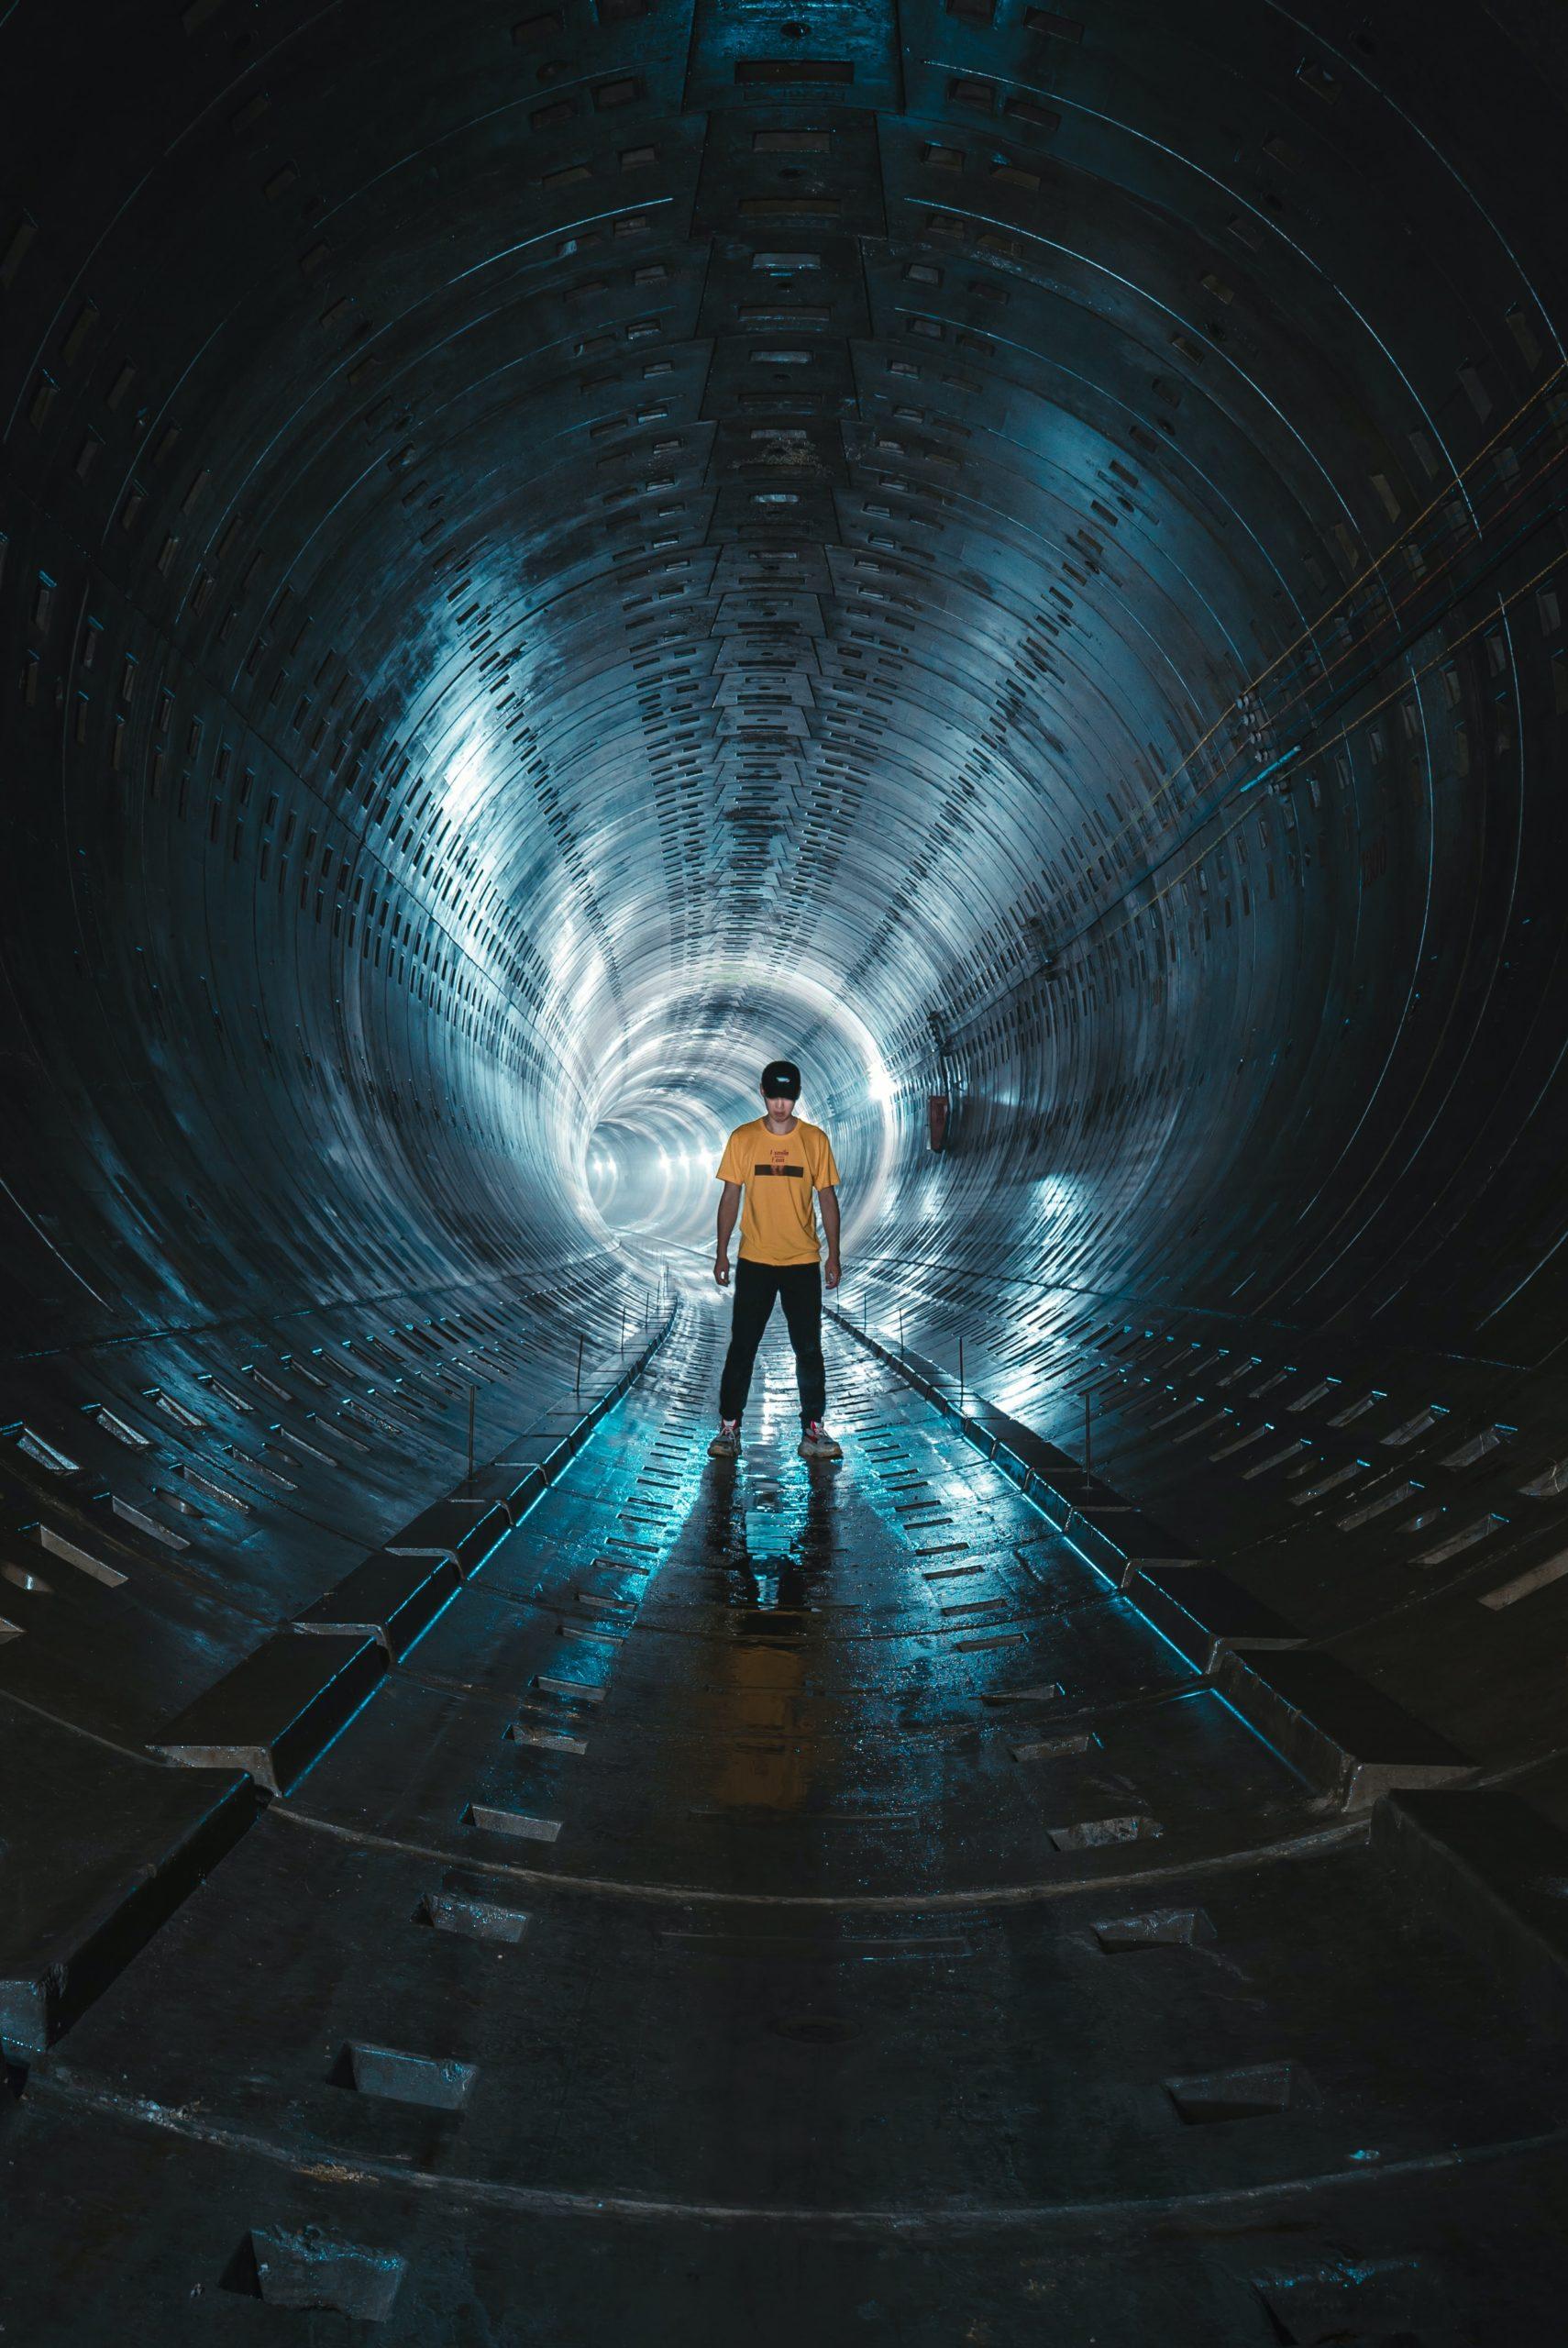 Tunnel_man